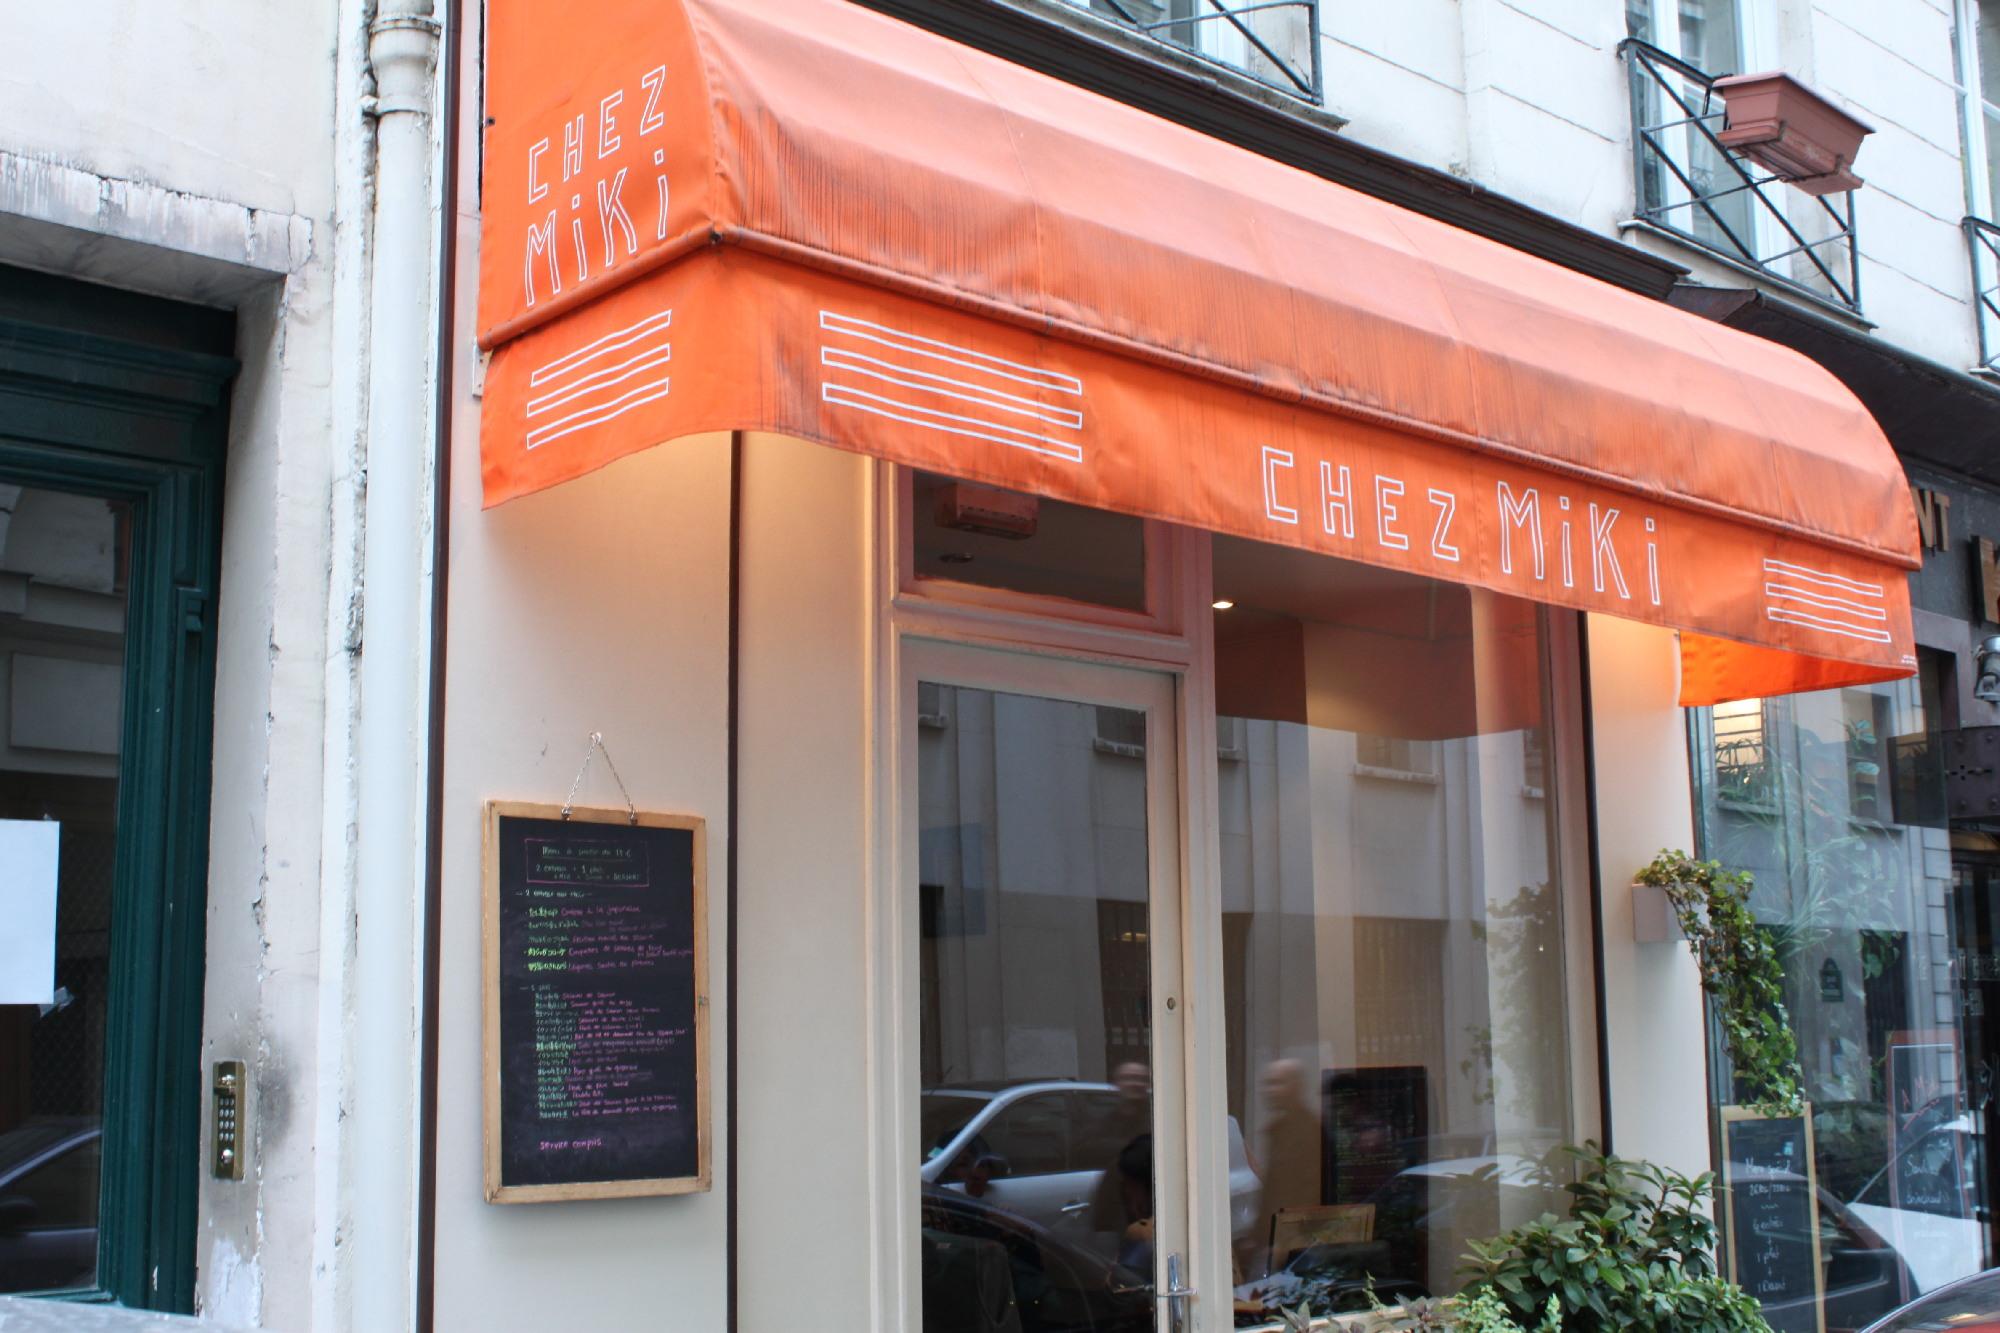 Restaurant: Chez Miki